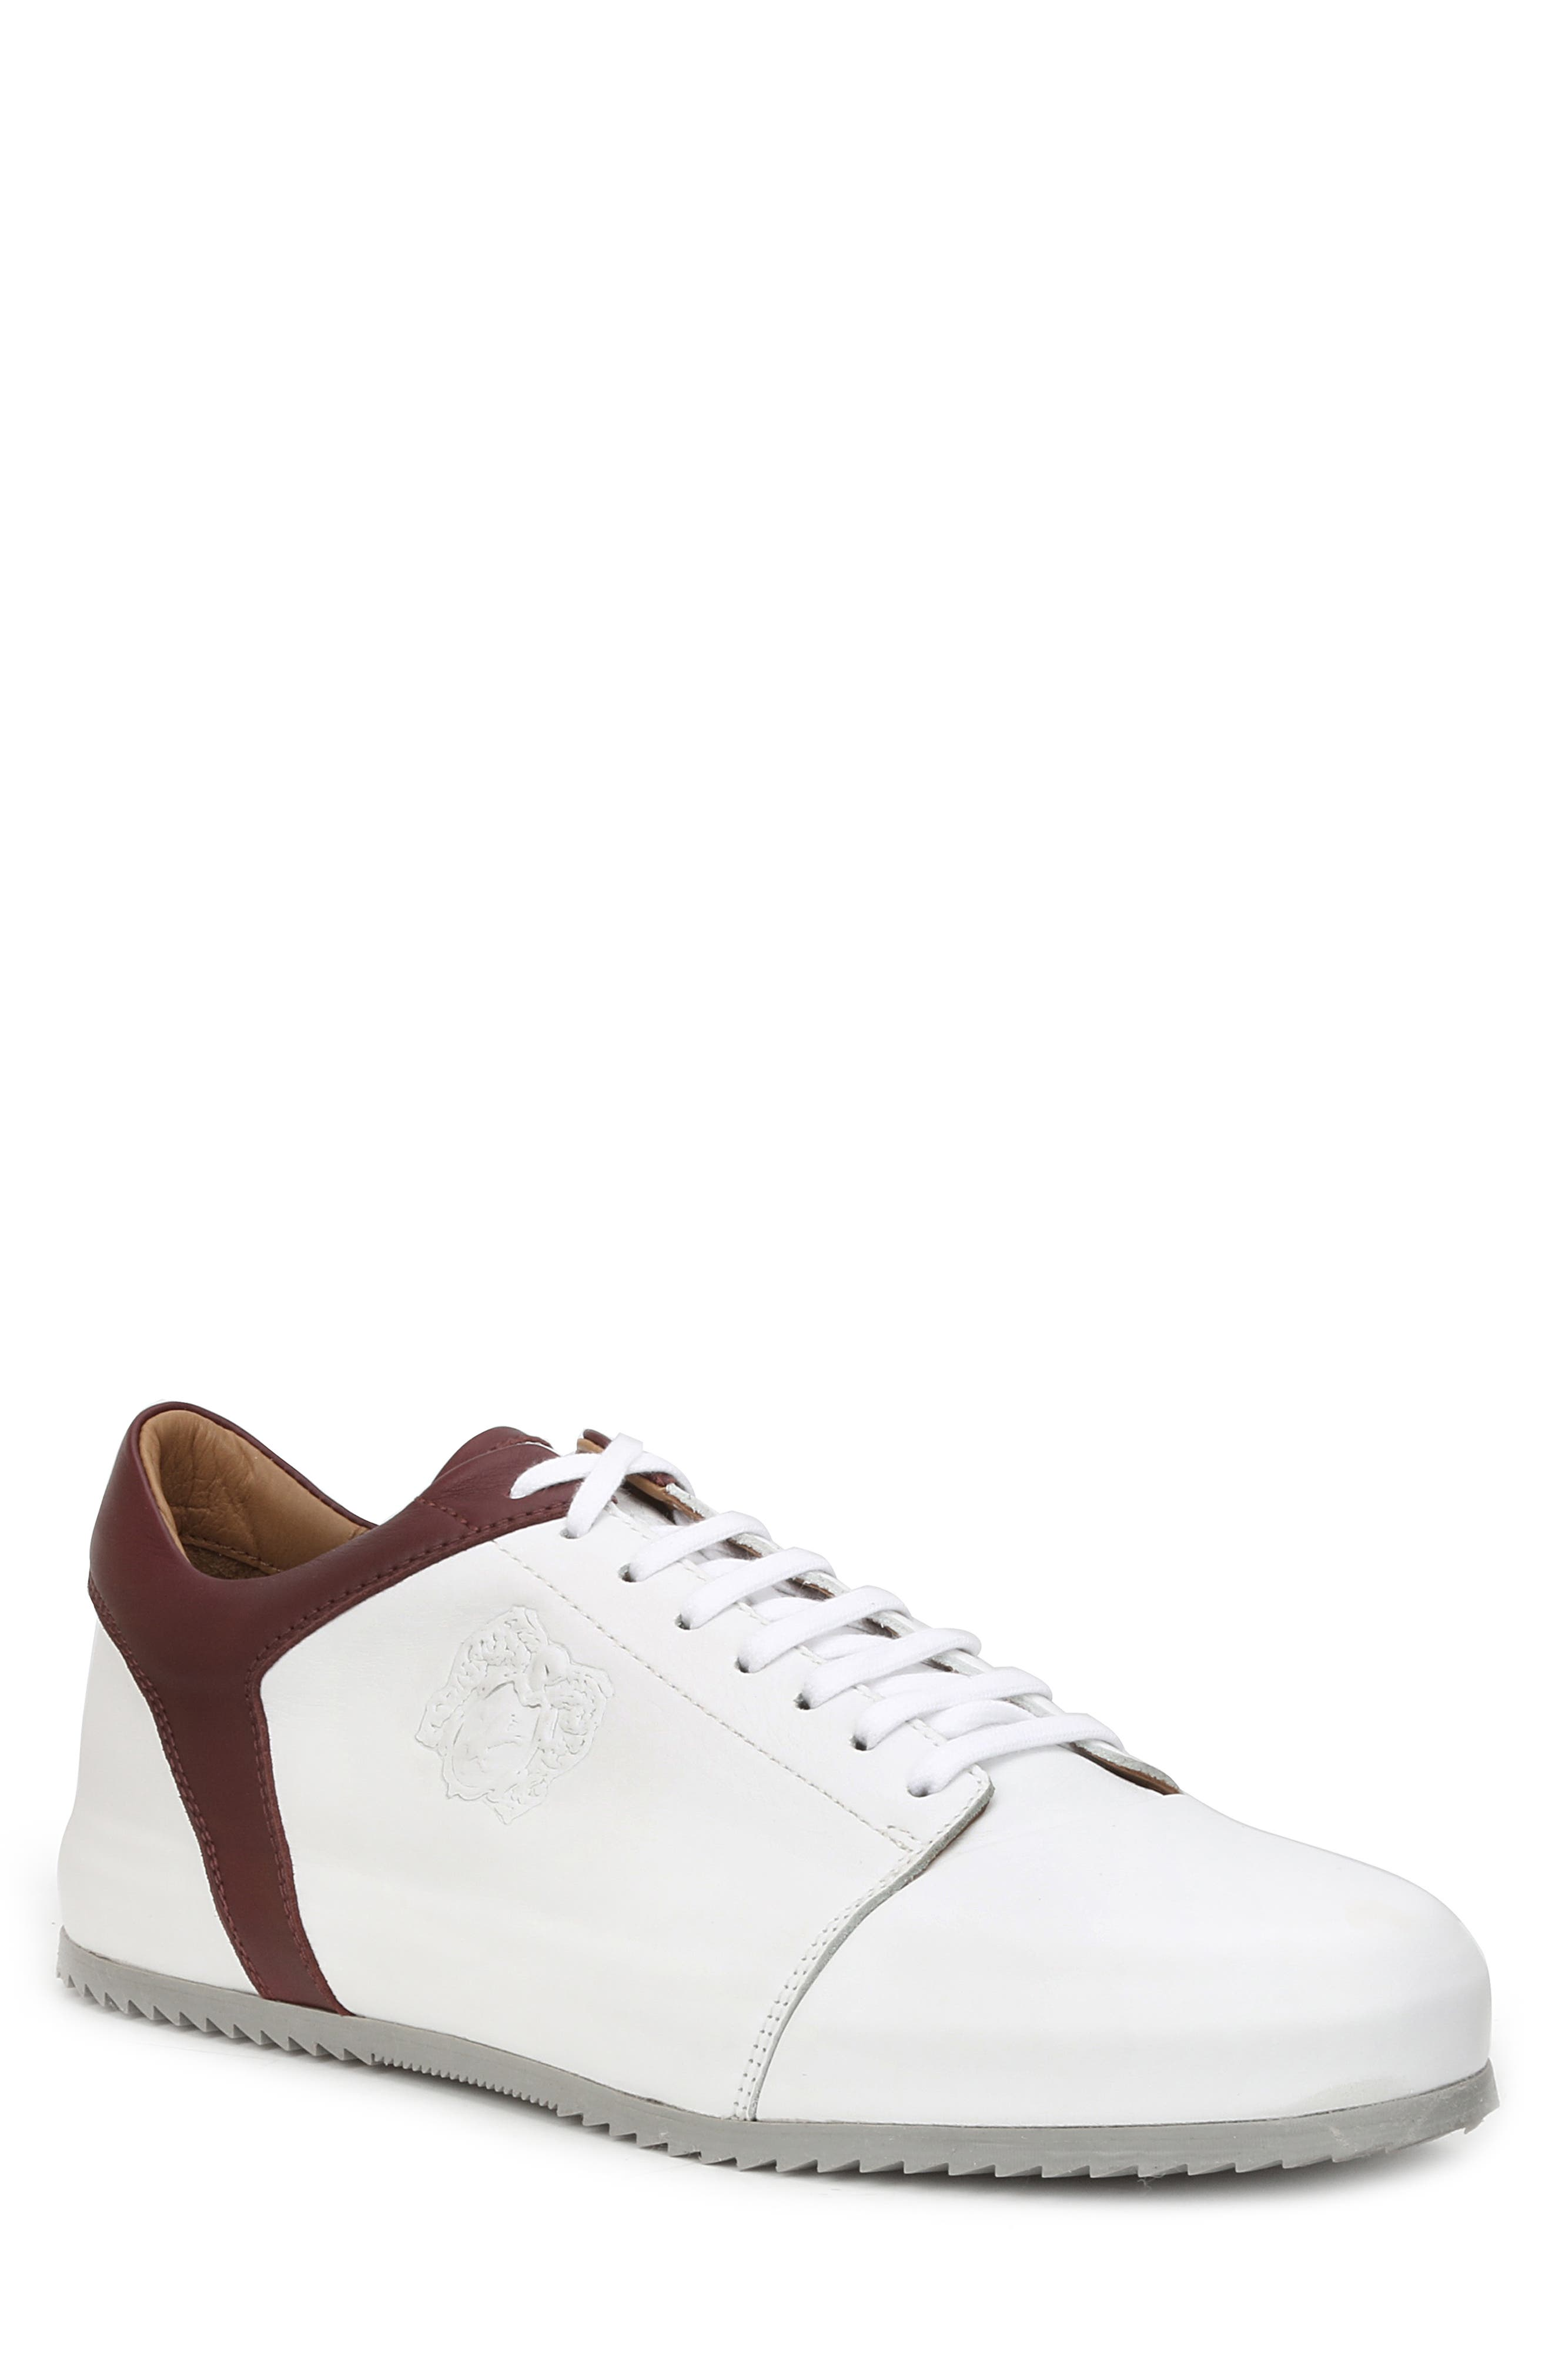 Santana Sneaker,                             Main thumbnail 1, color,                             WHITE/ BORDEAUX